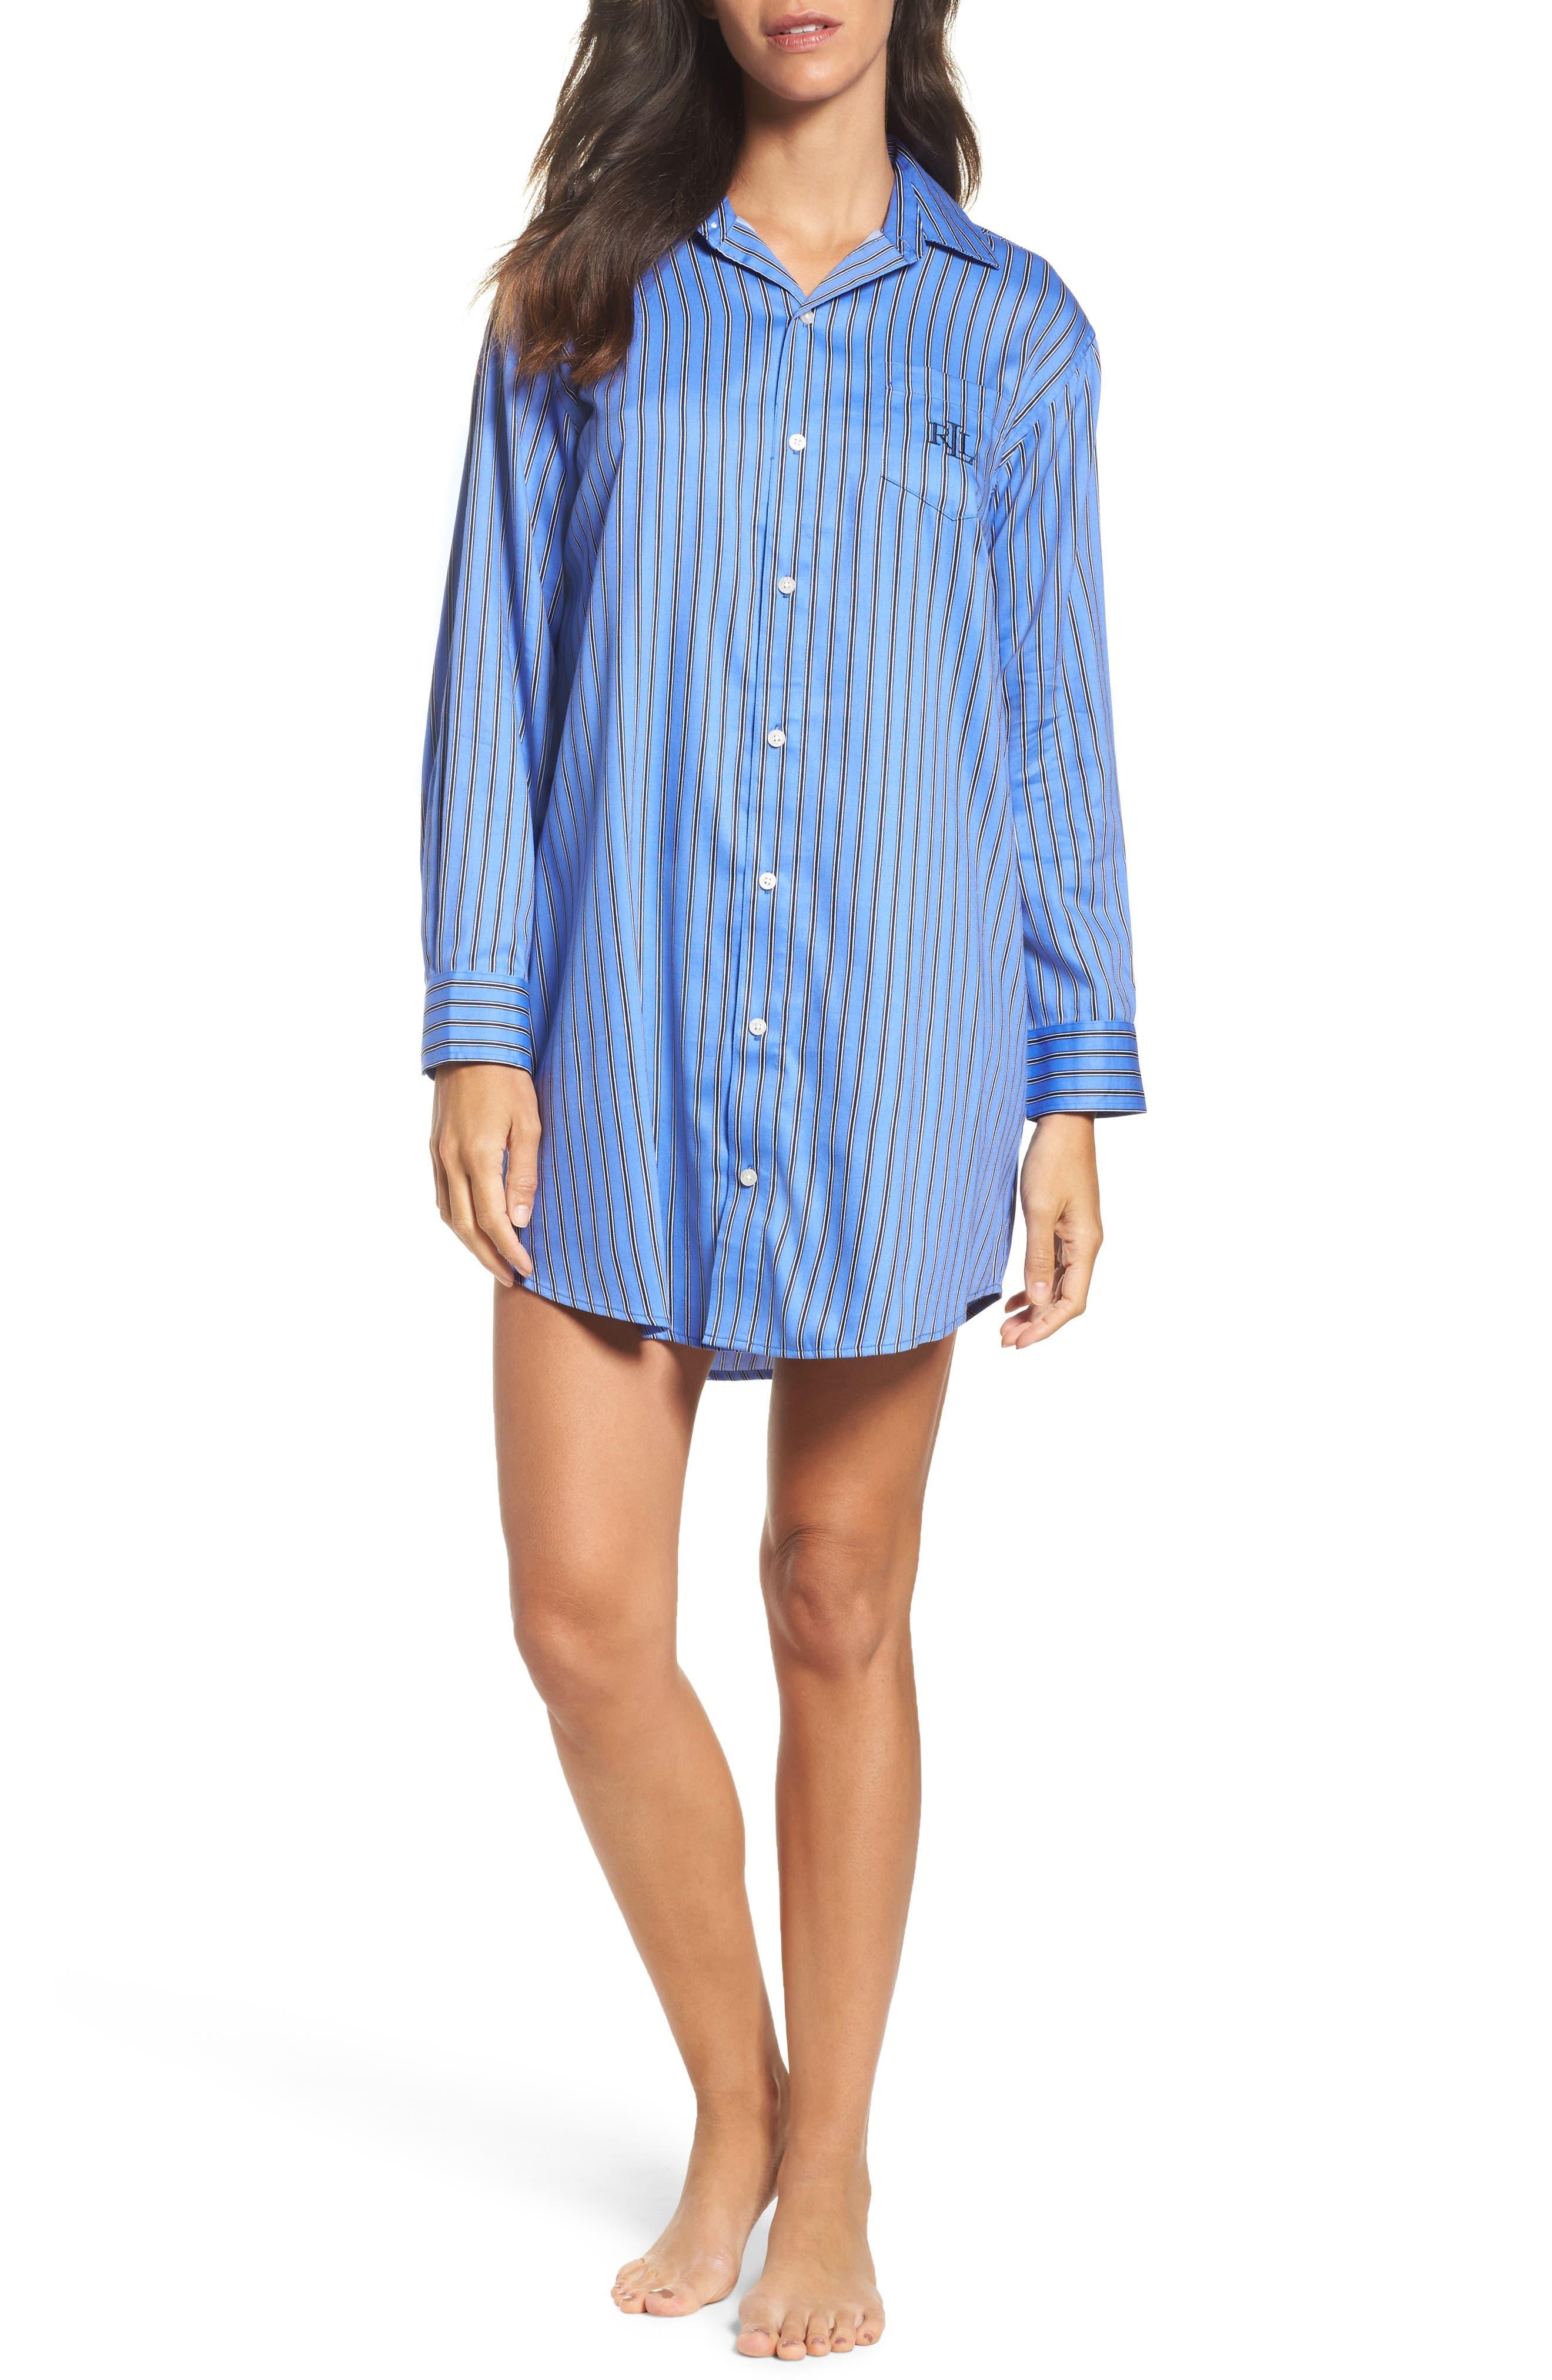 Alternate Image 1 Selected - Lauren by Ralph Lauren Paisley Sleep Shirt